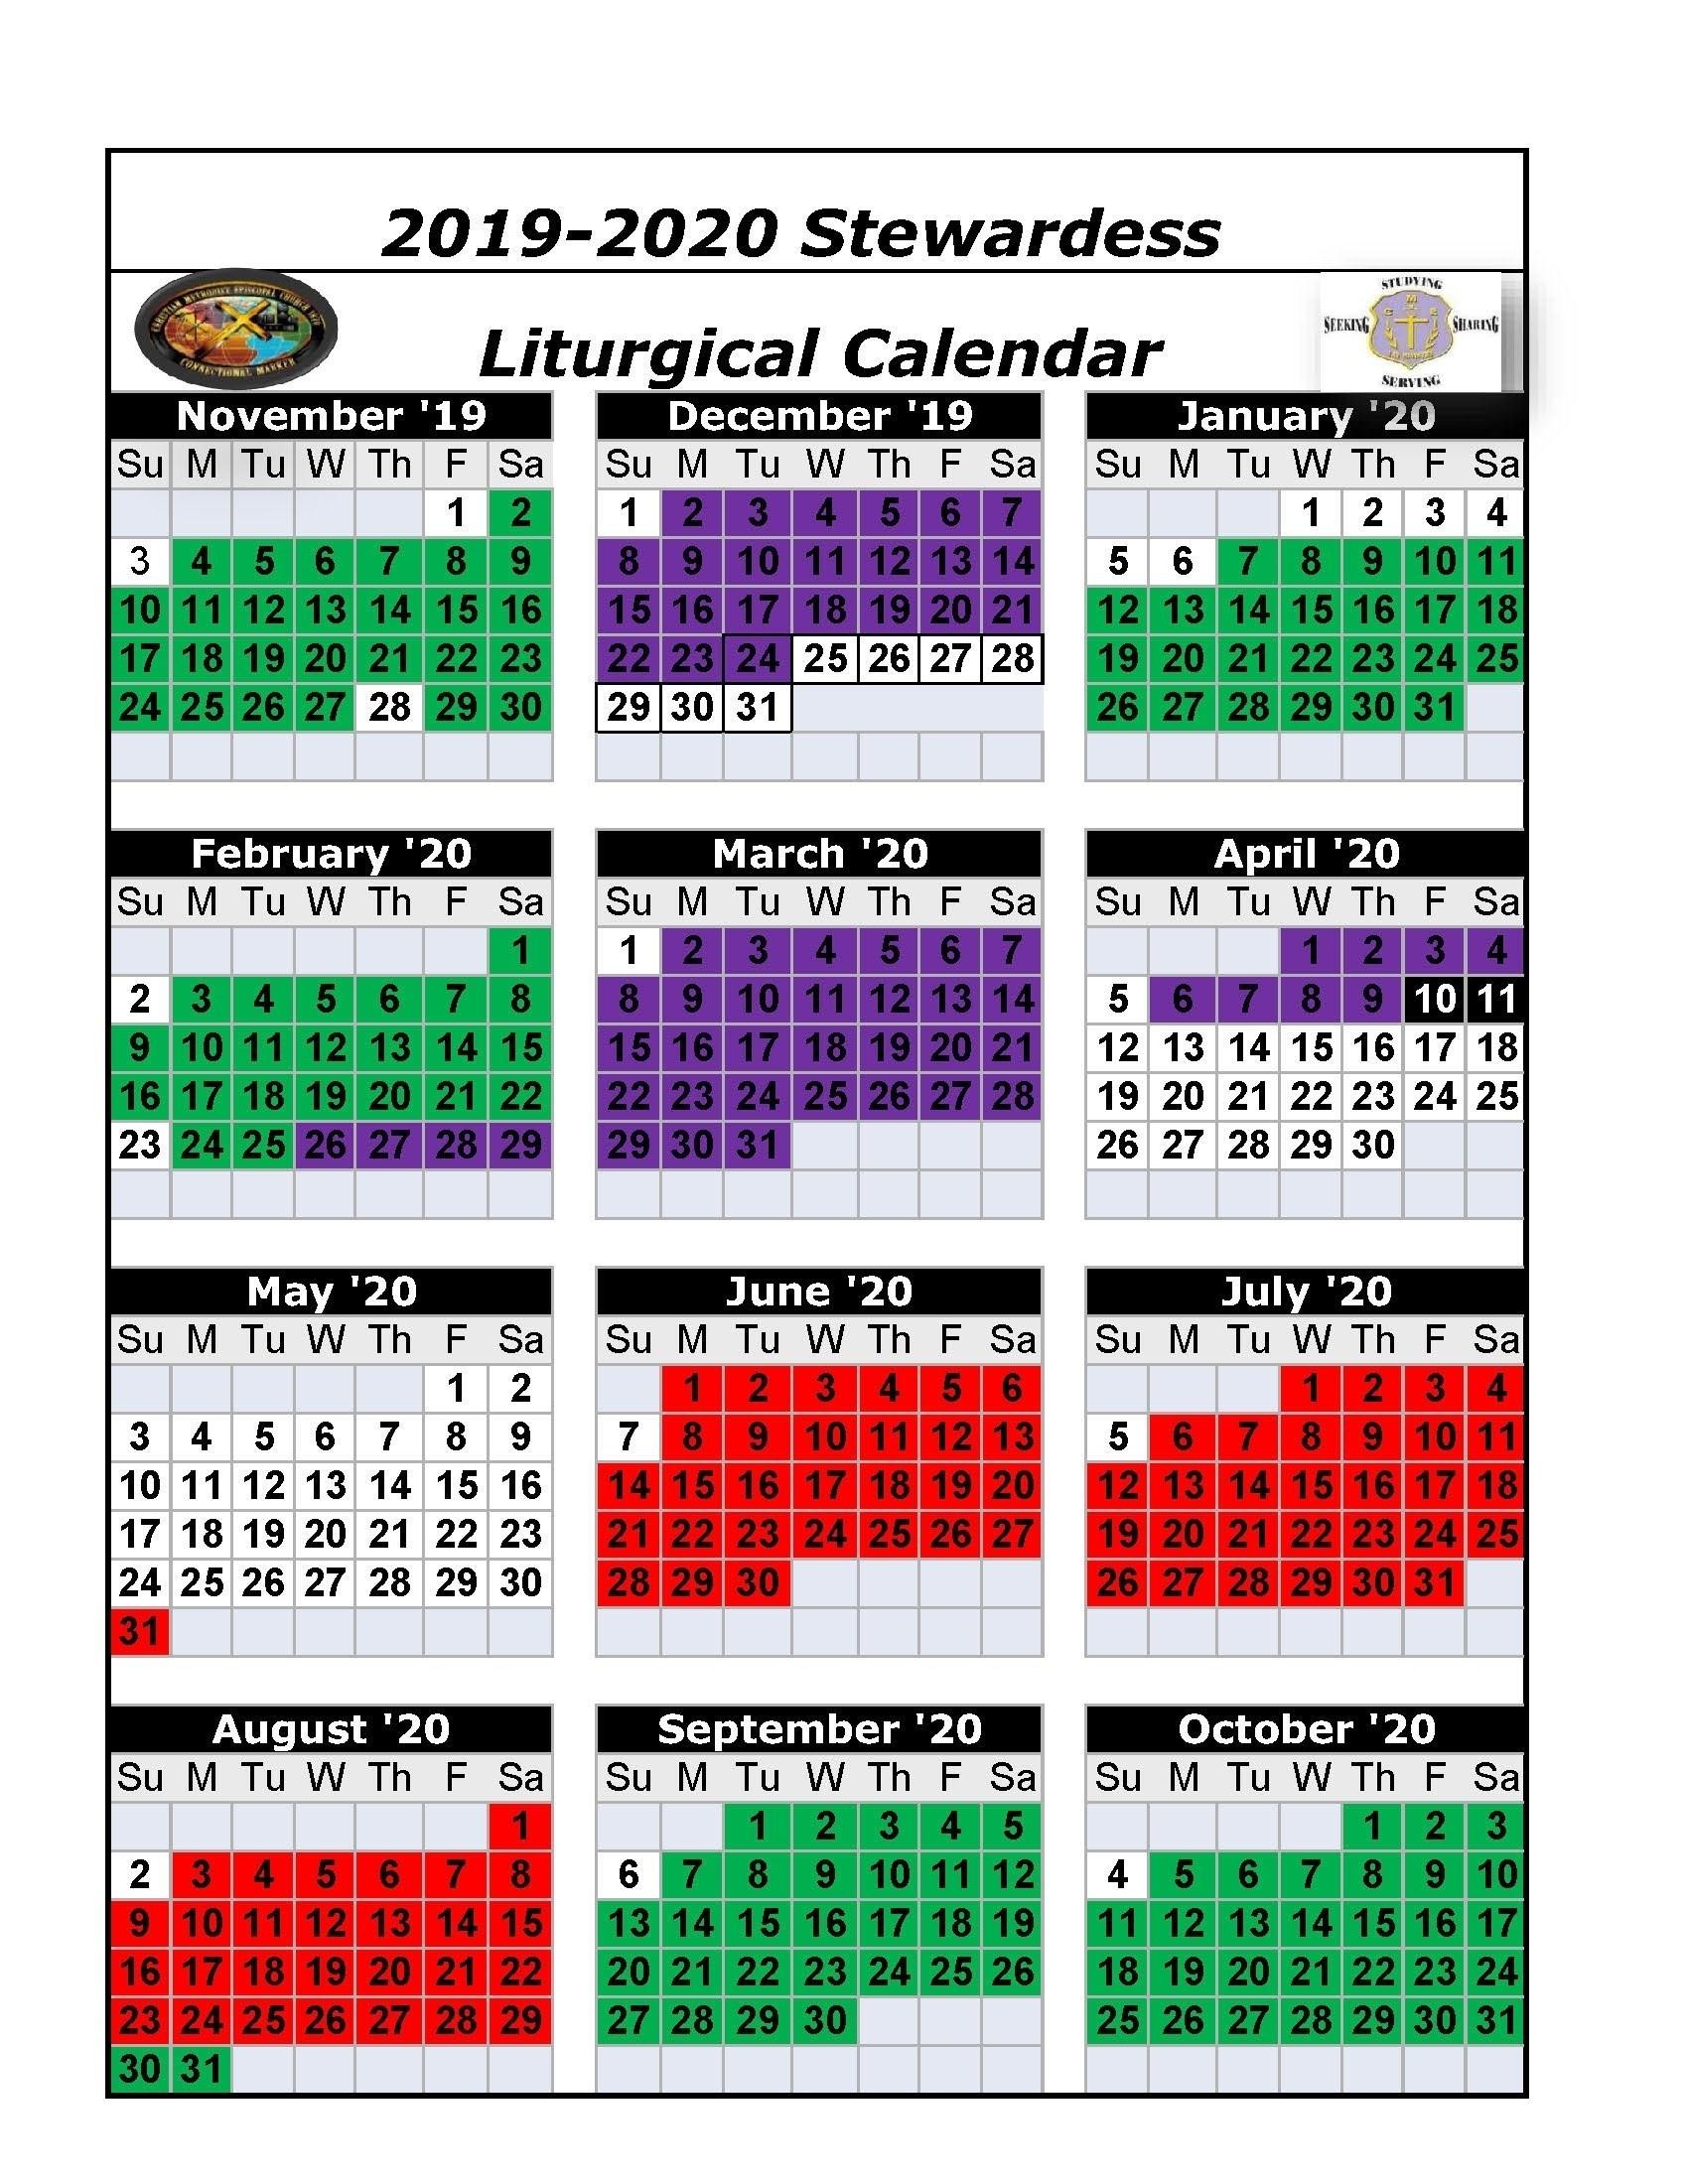 United Methodist Liturgical Calendar 2021 - Template  Liturgical Calendar Dates For 2021